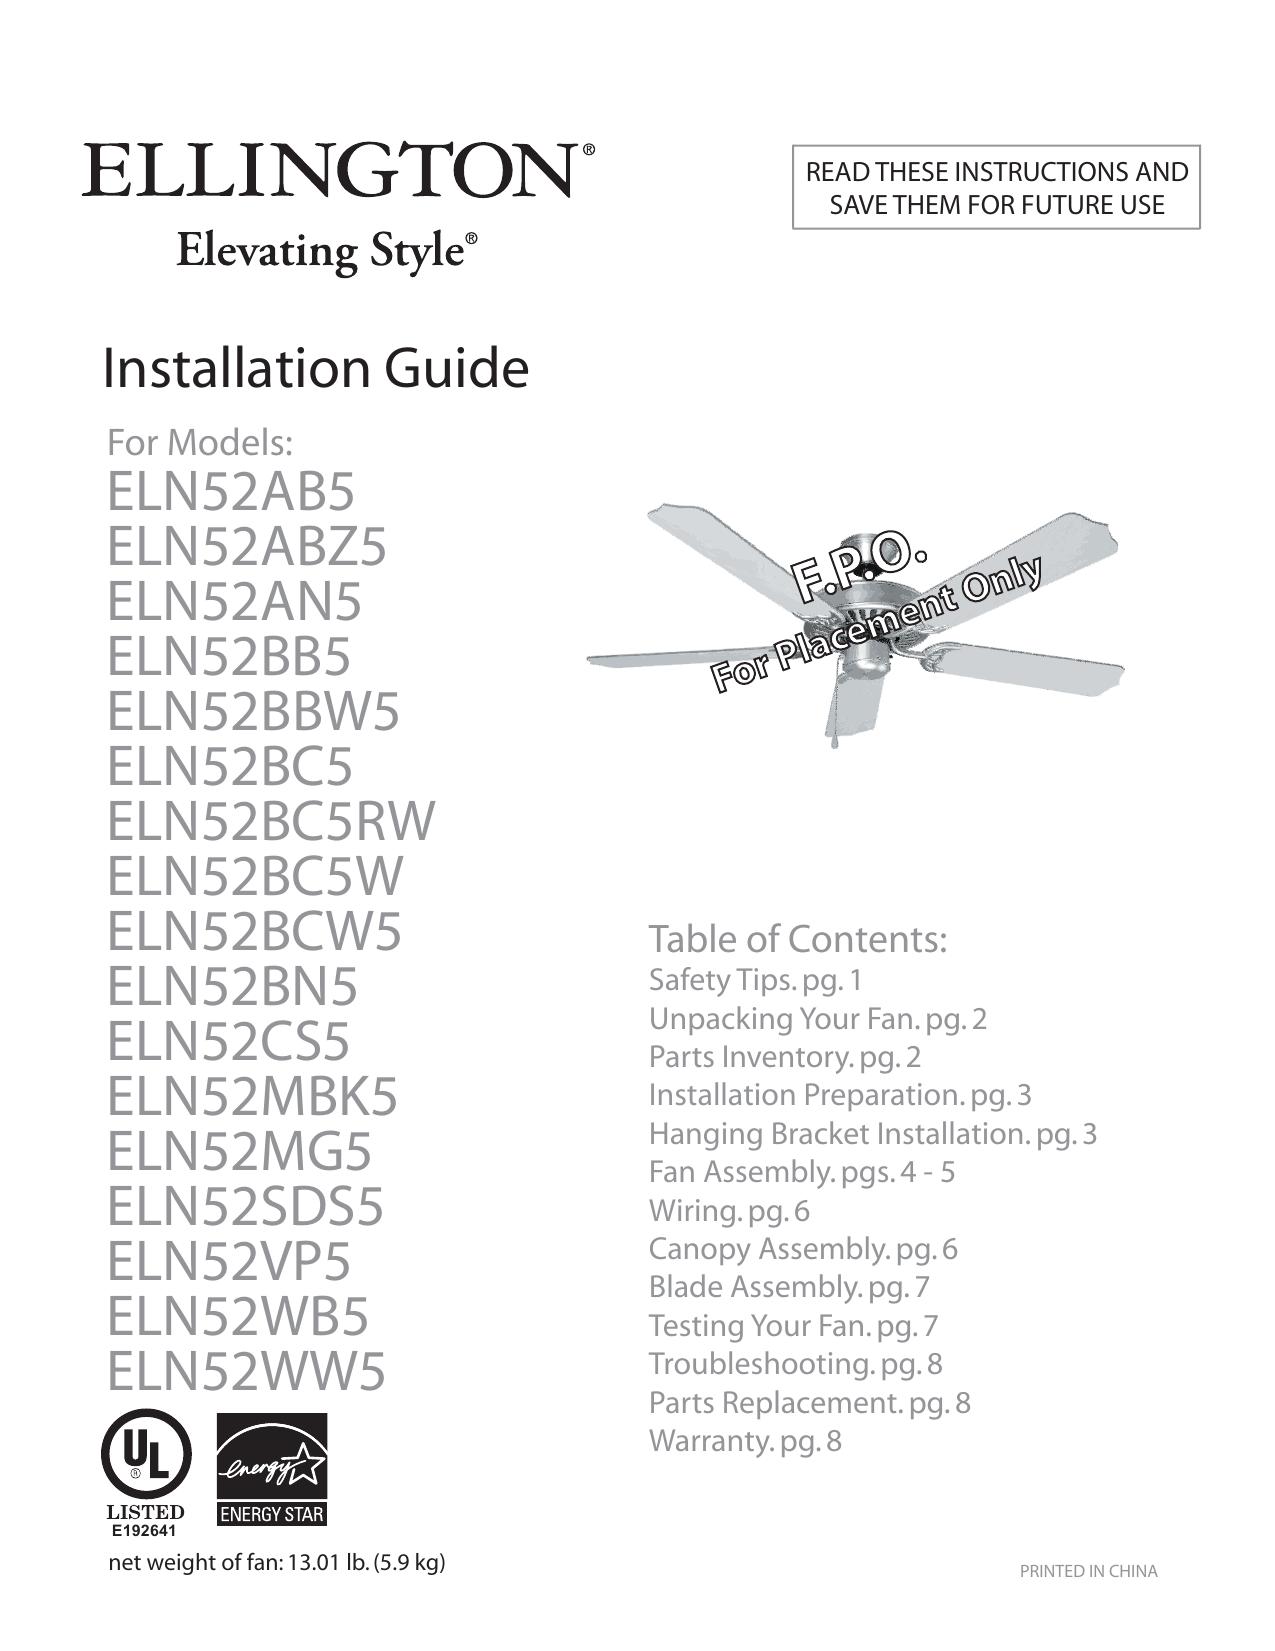 Ellington 52 Inch Ceiling Fan Installation Instructions | Manualzzmanualzz